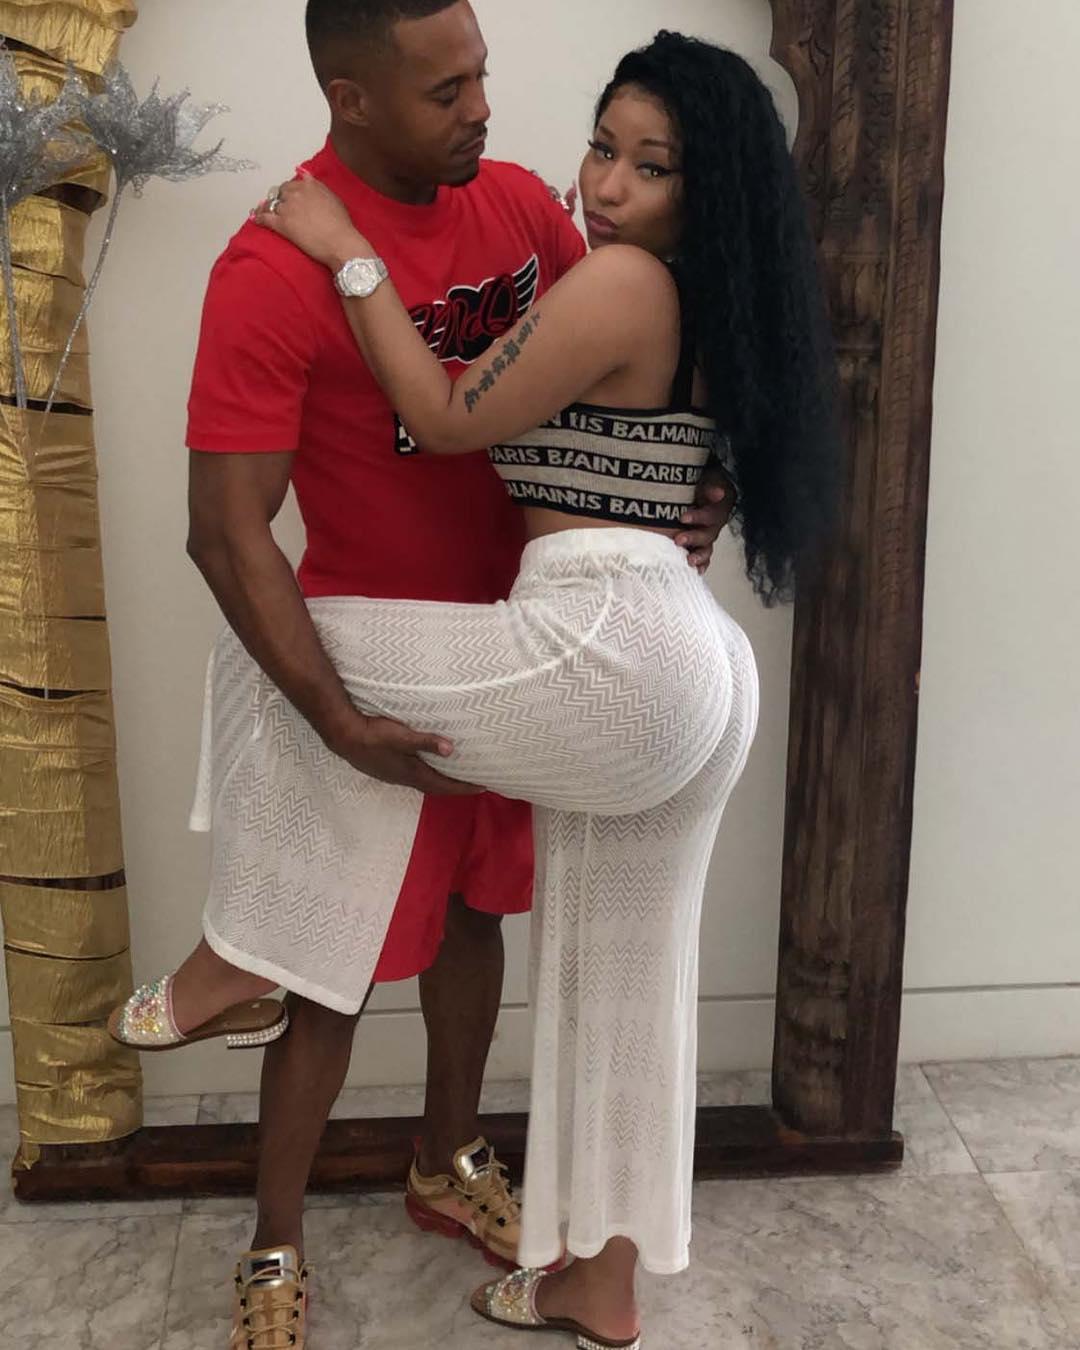 Nicki Minaj & Convicted Rapist Boyfriend Make It IG Official